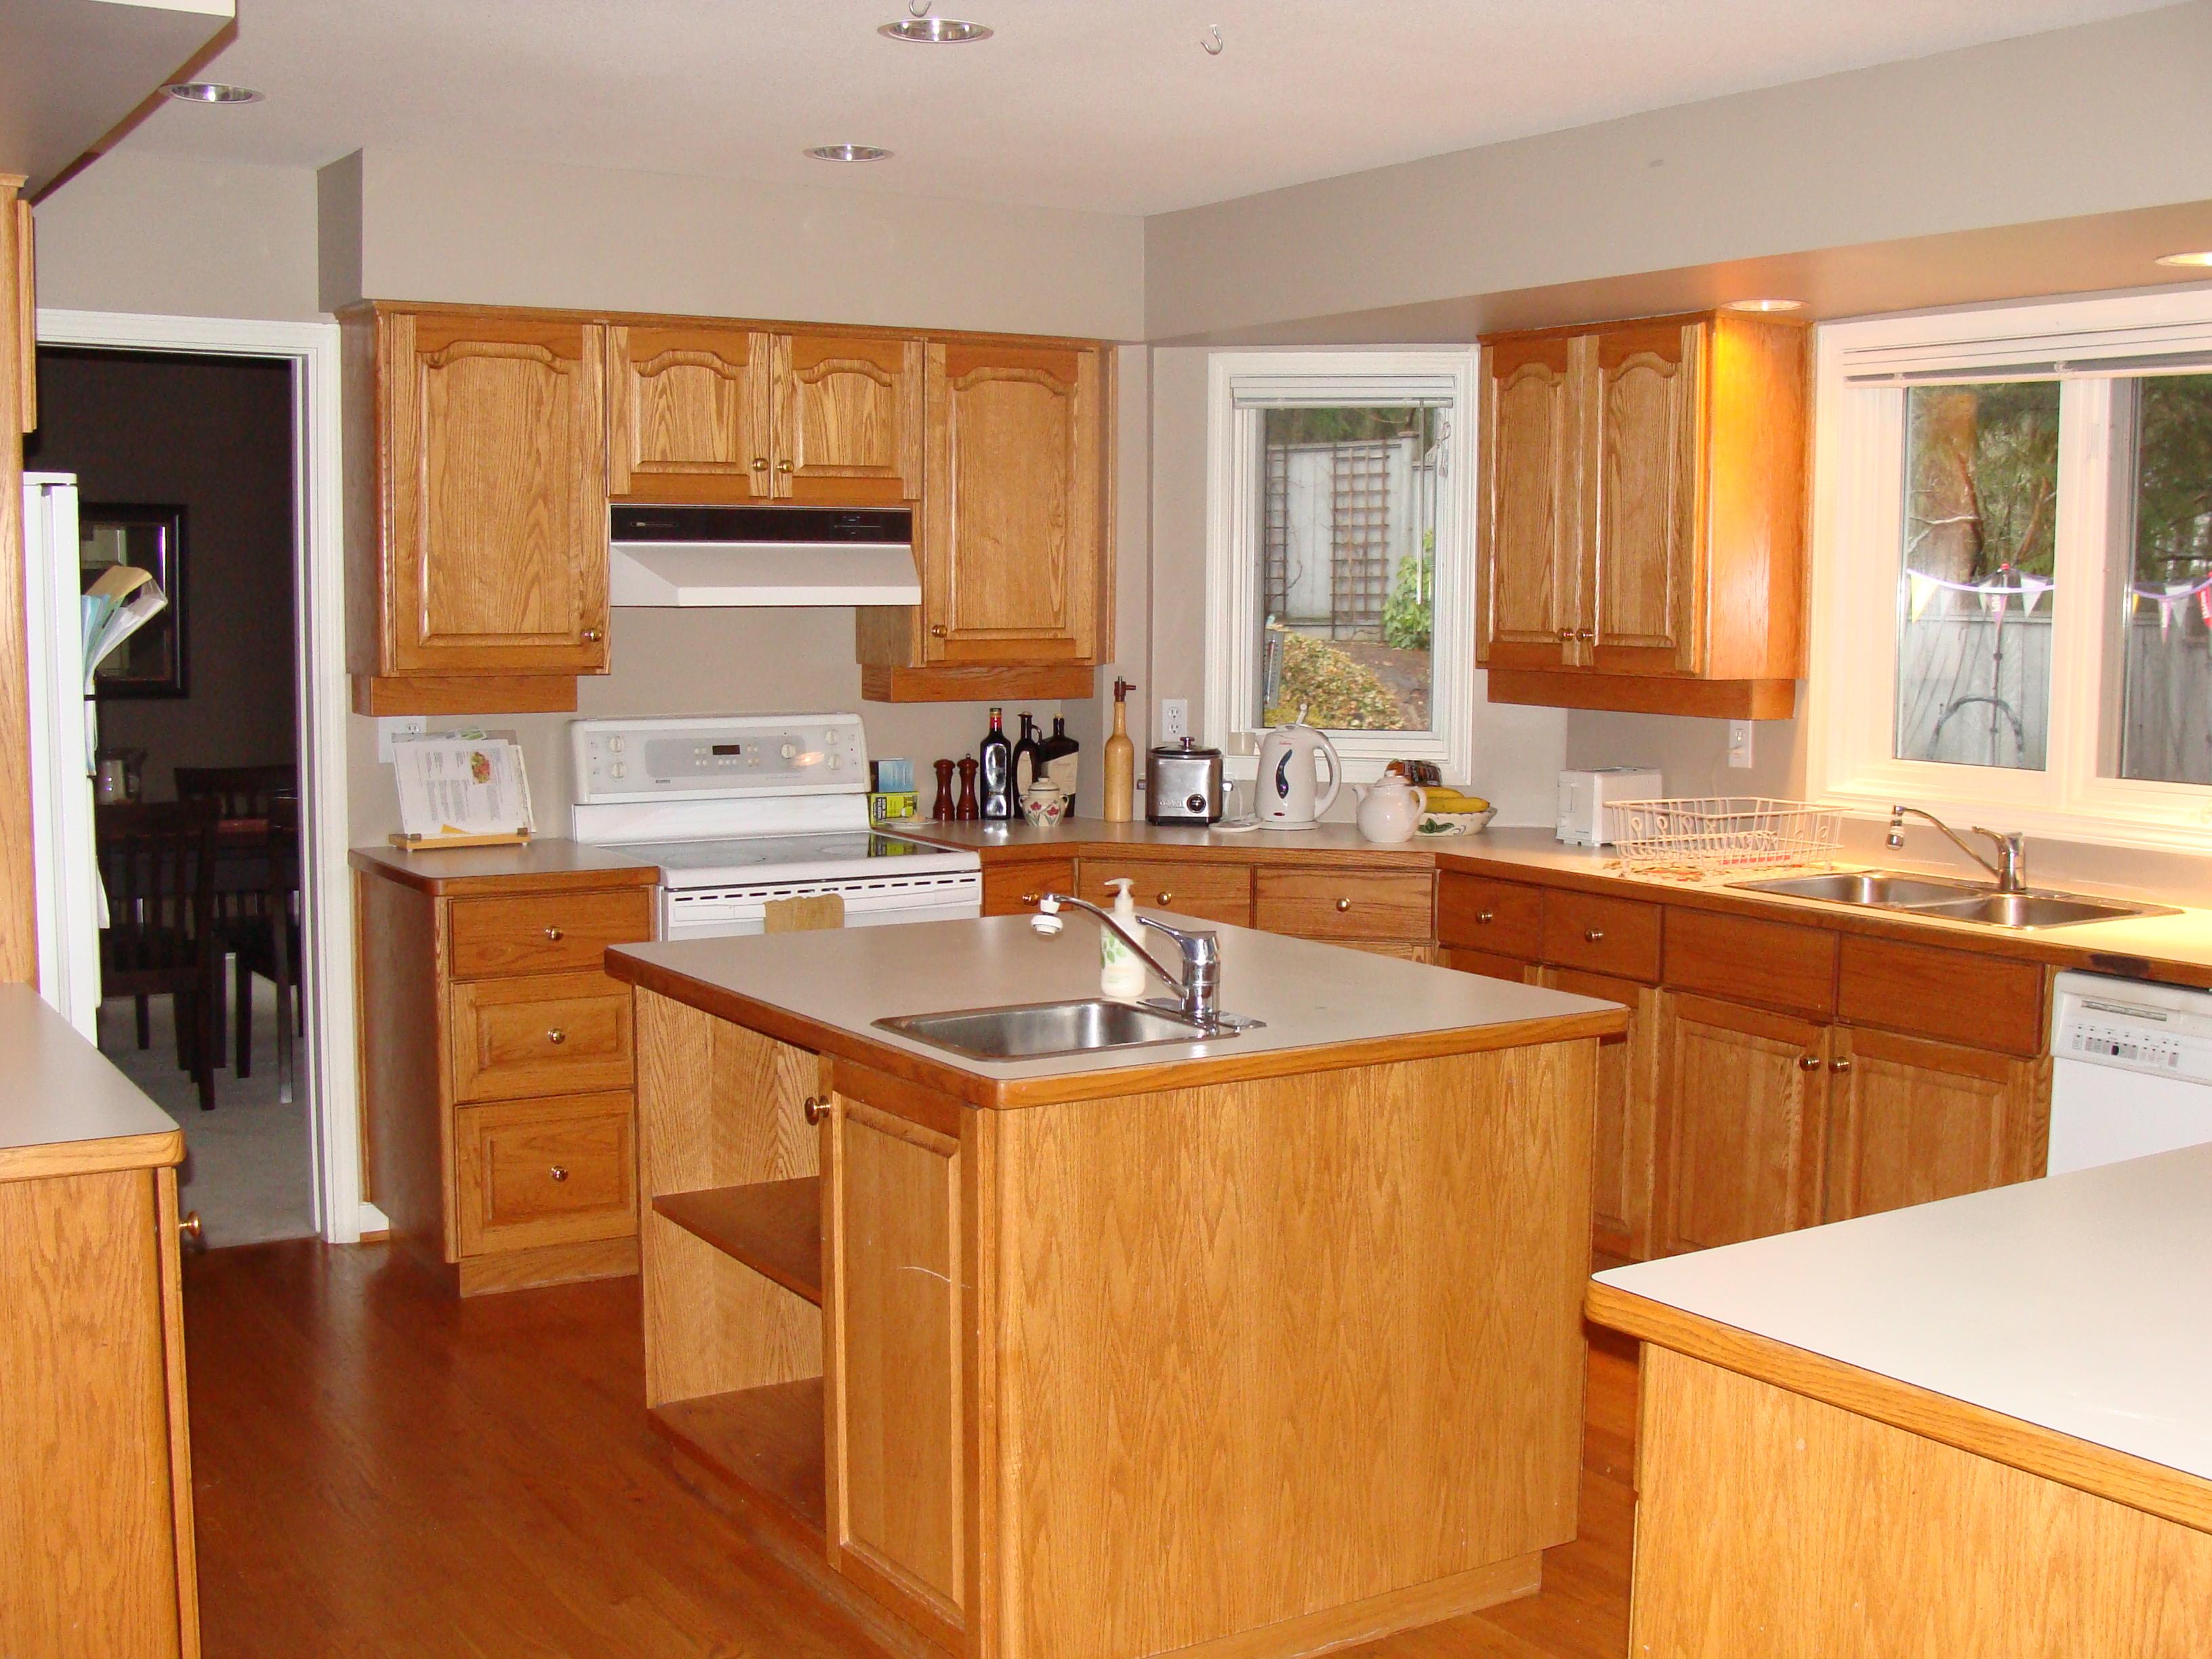 Colored small kitchen appliances Photo - 5